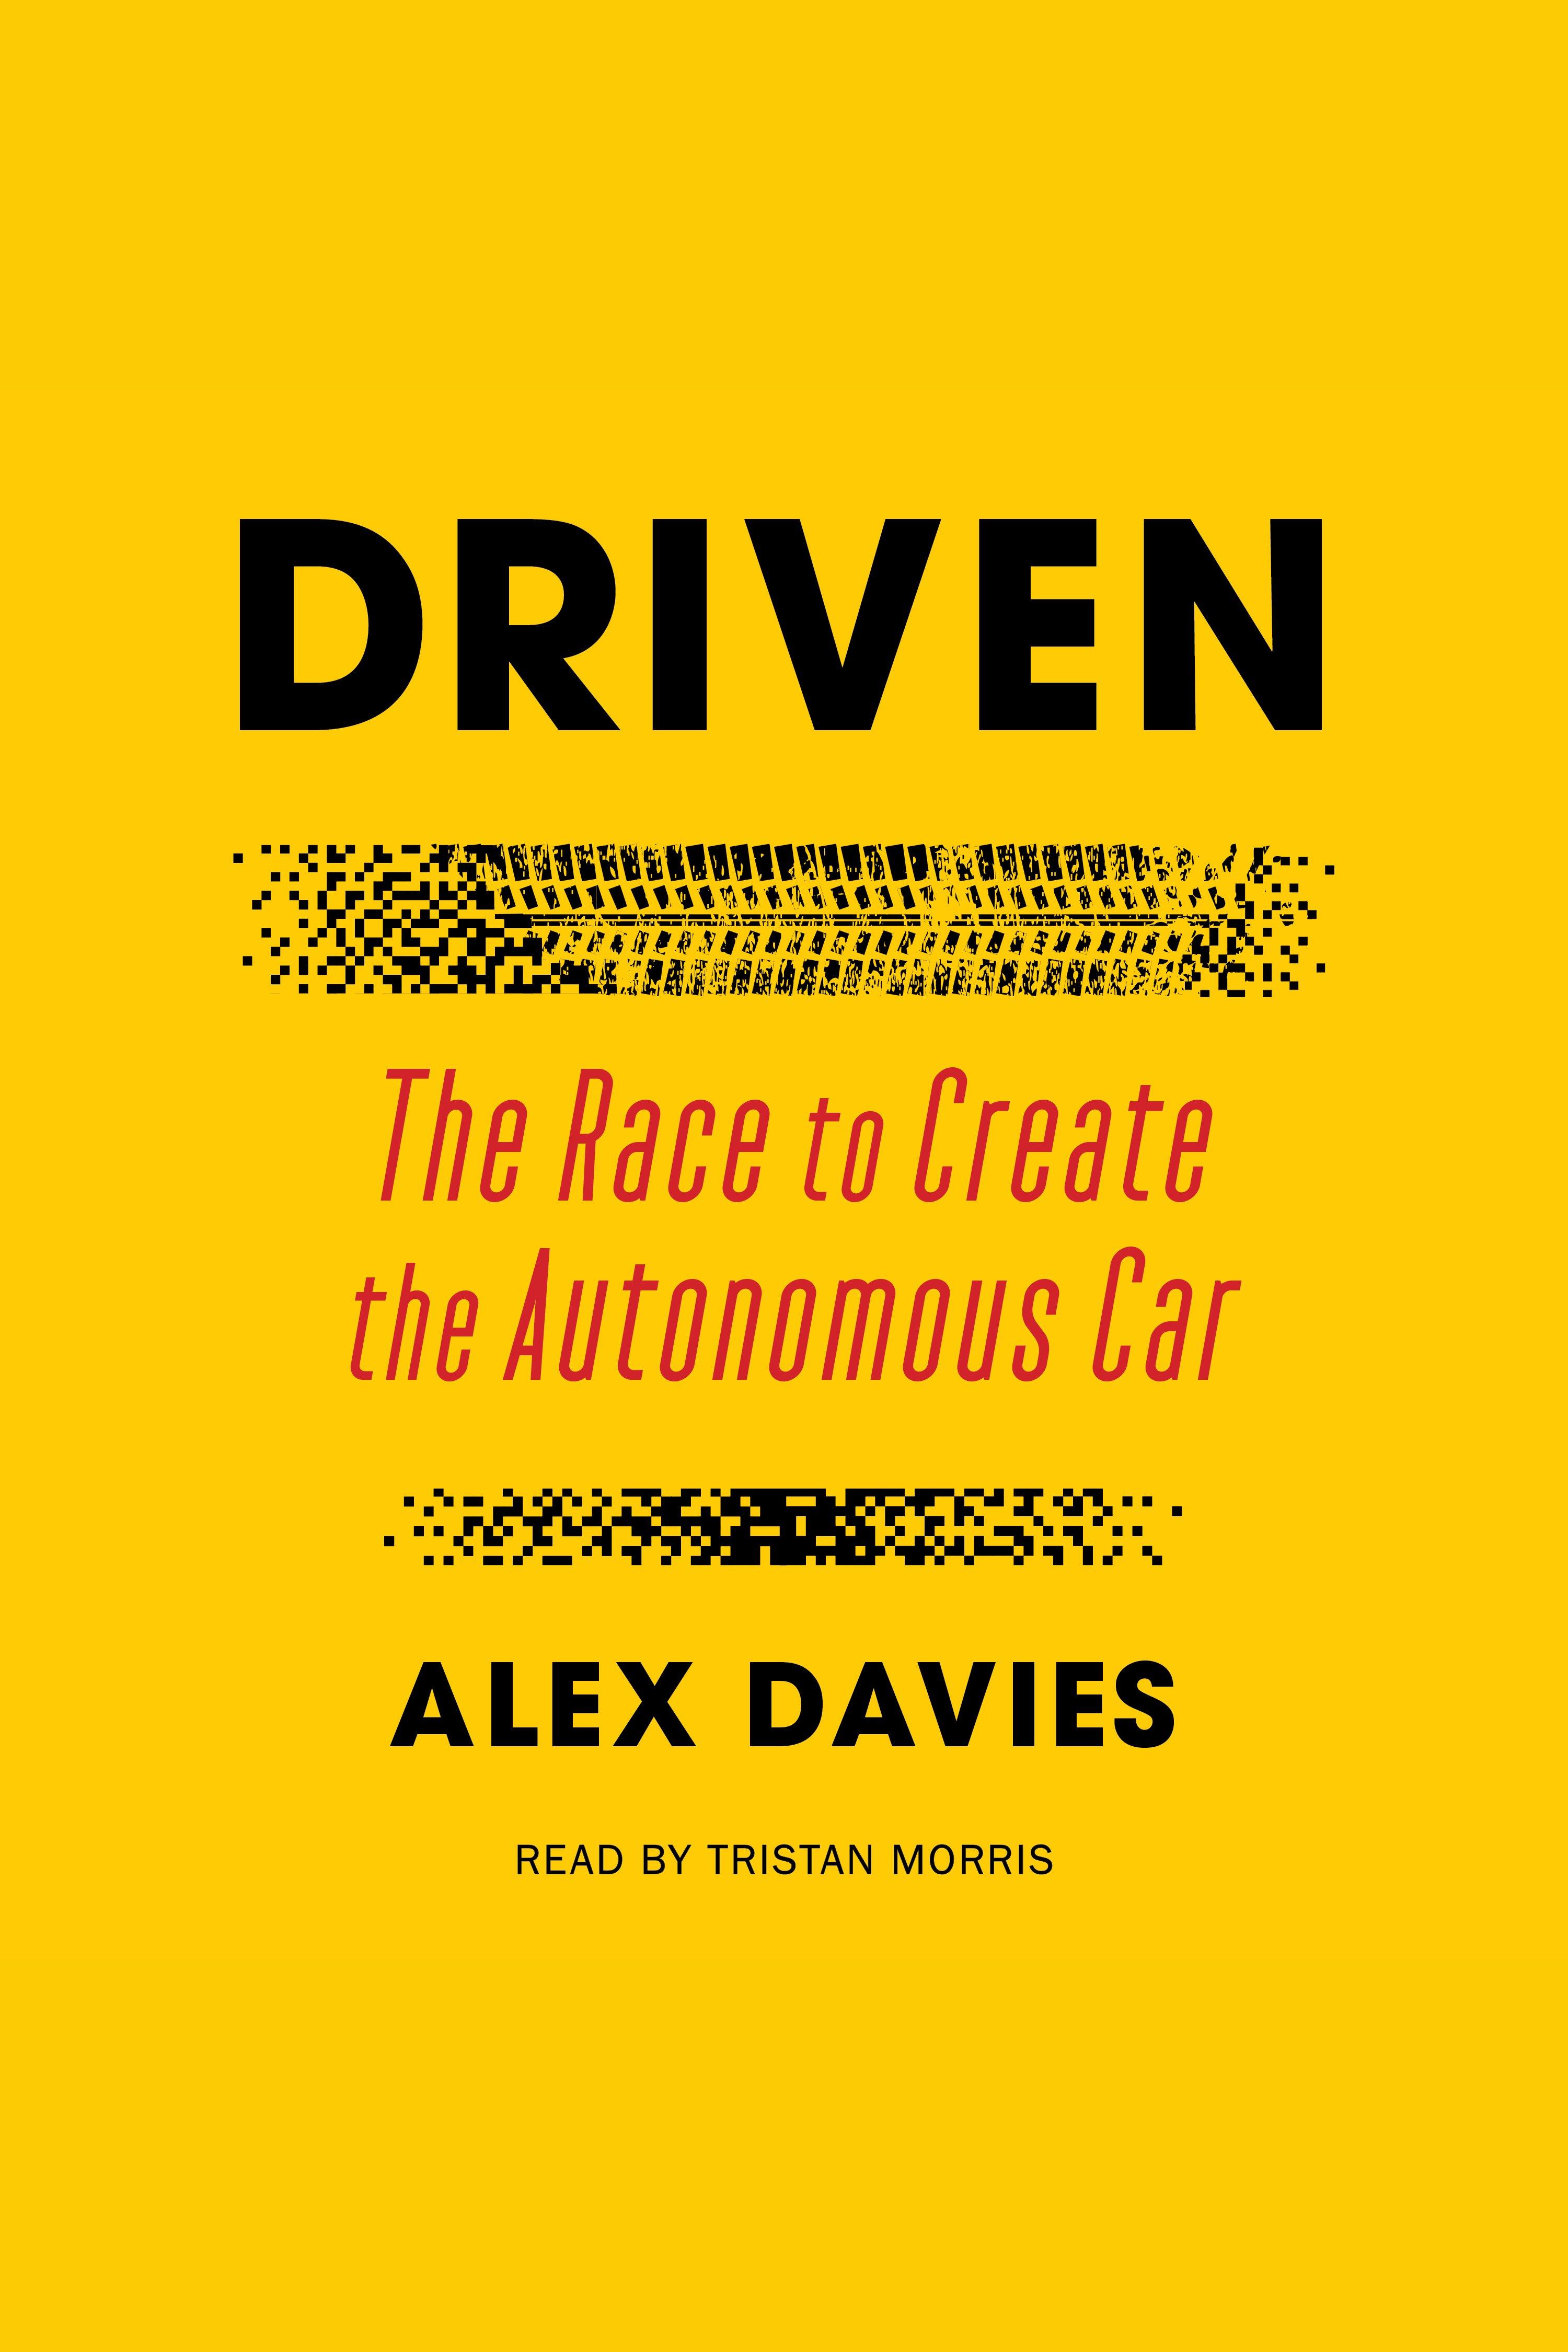 Driven The Race to Create the Autonomous Car